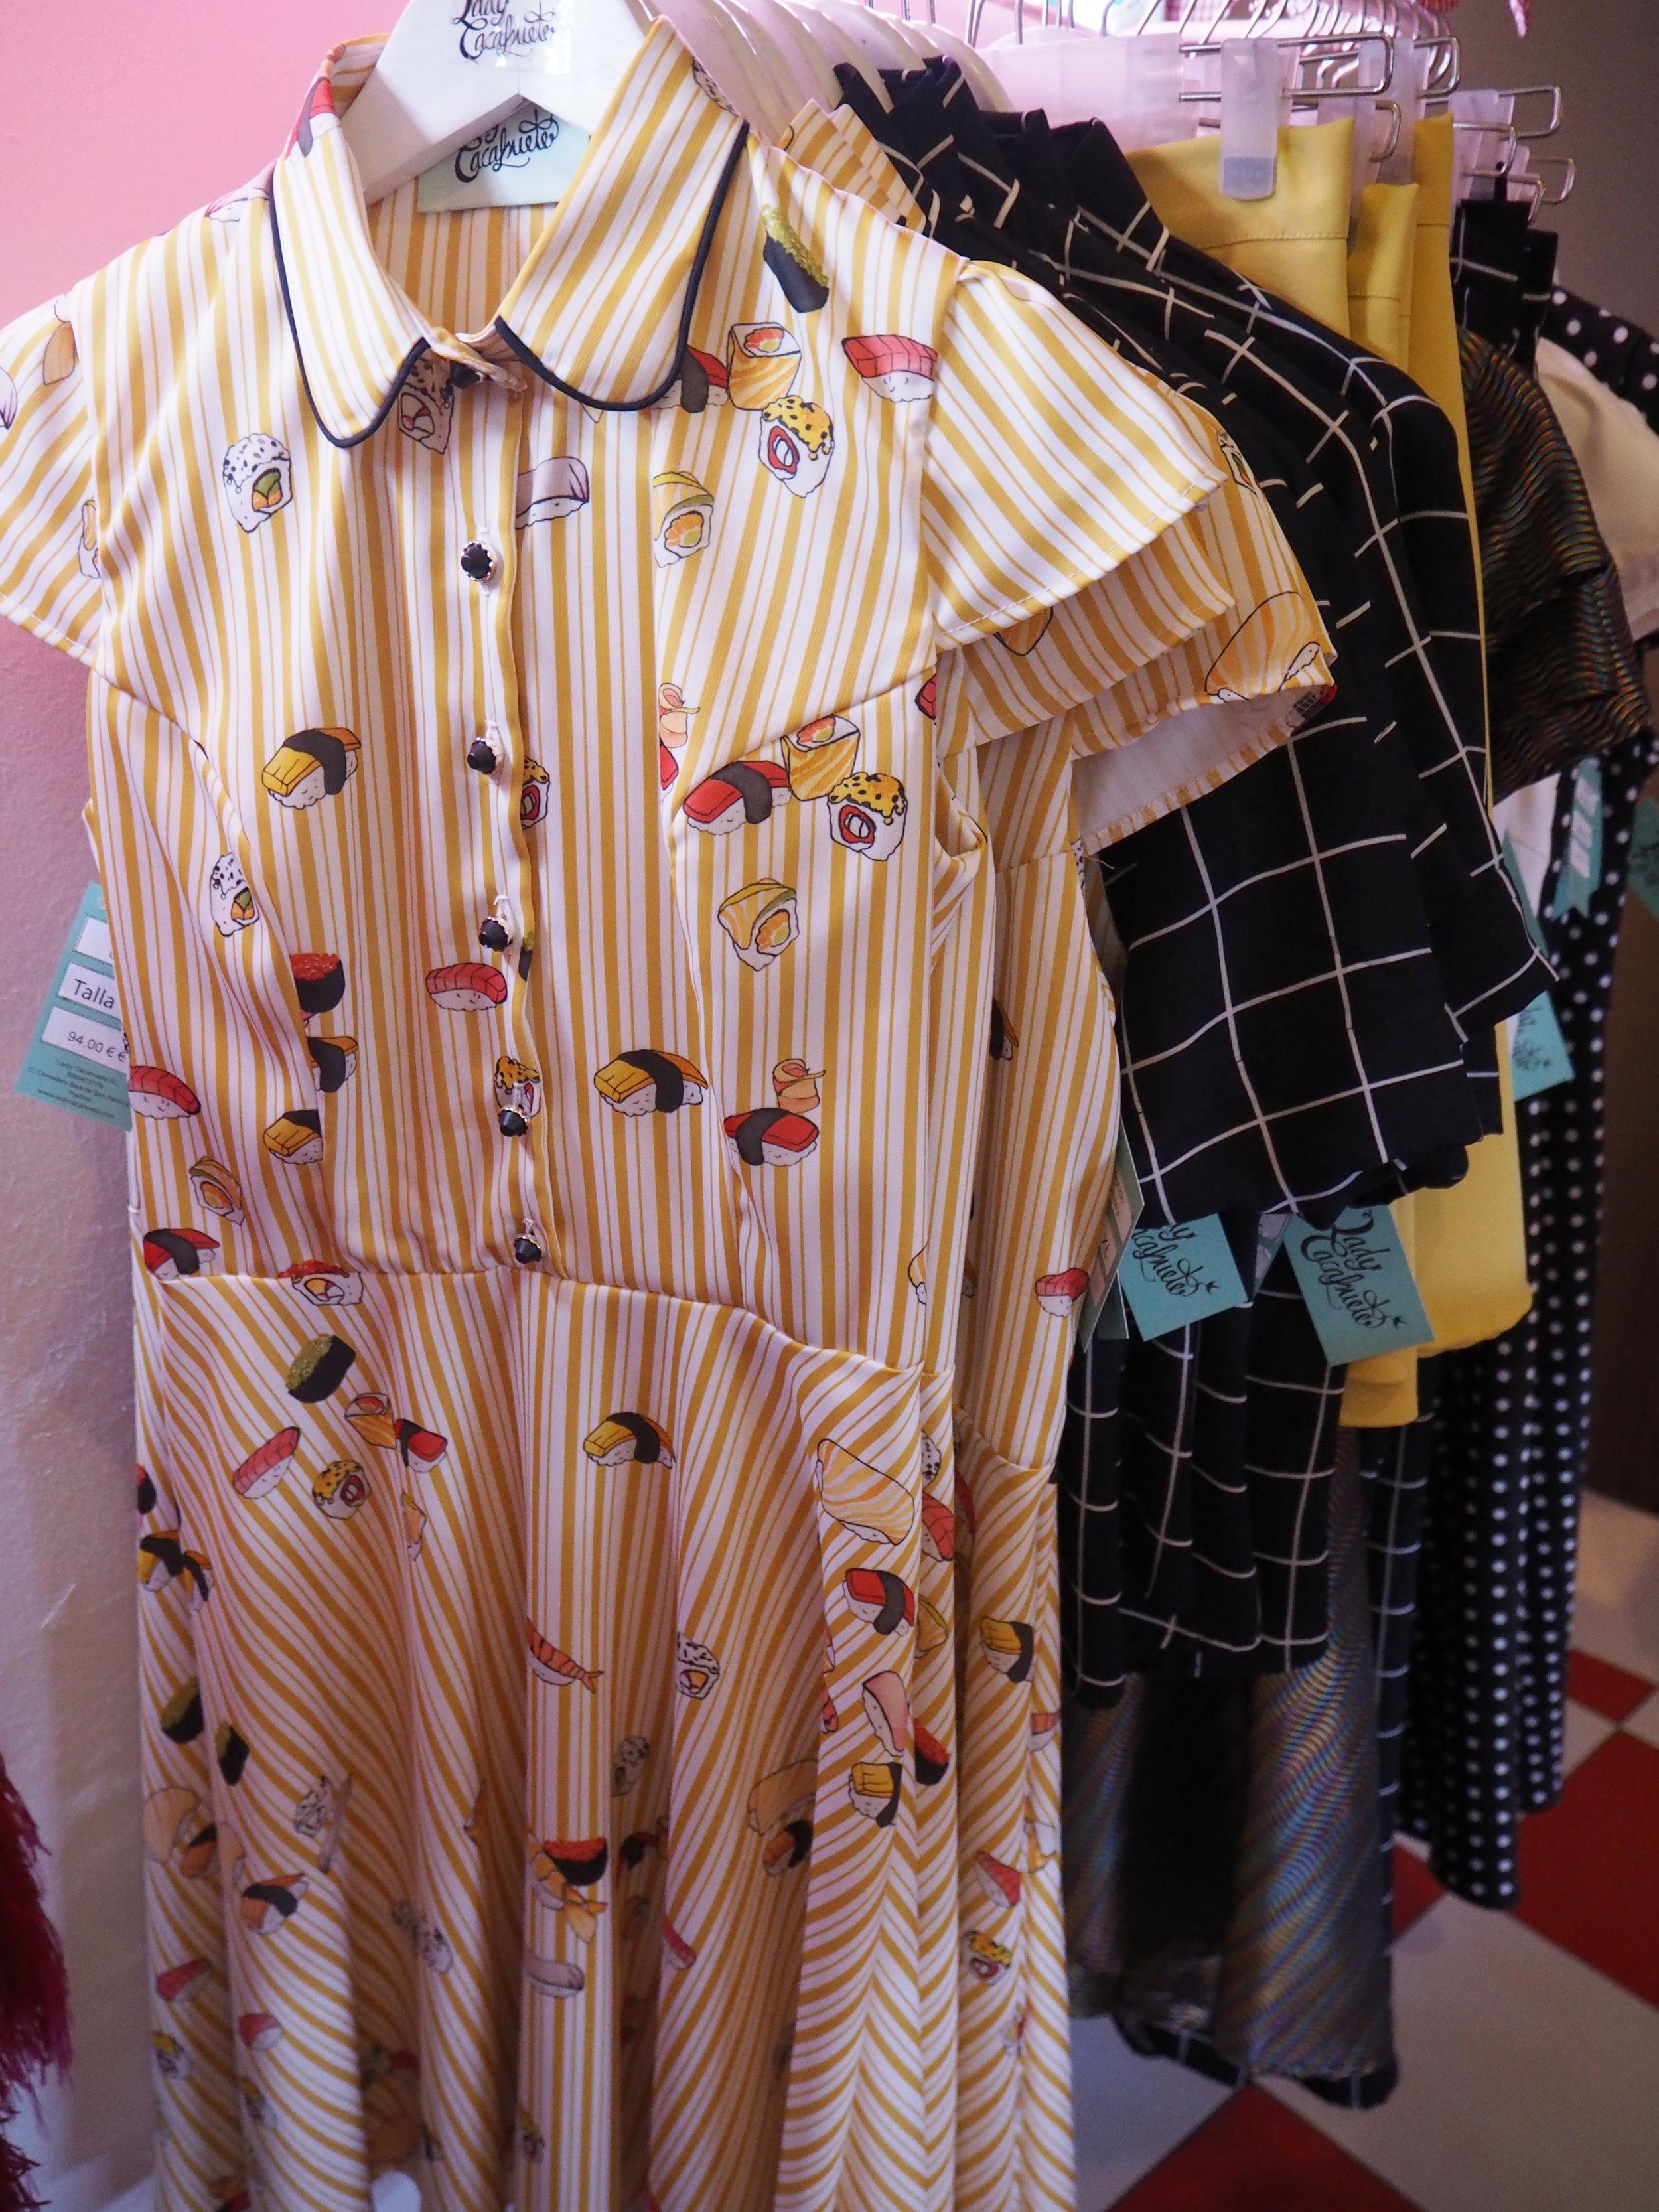 tiendas-ropa-madrid-originles-lady-cachuete-japonesa.JPG